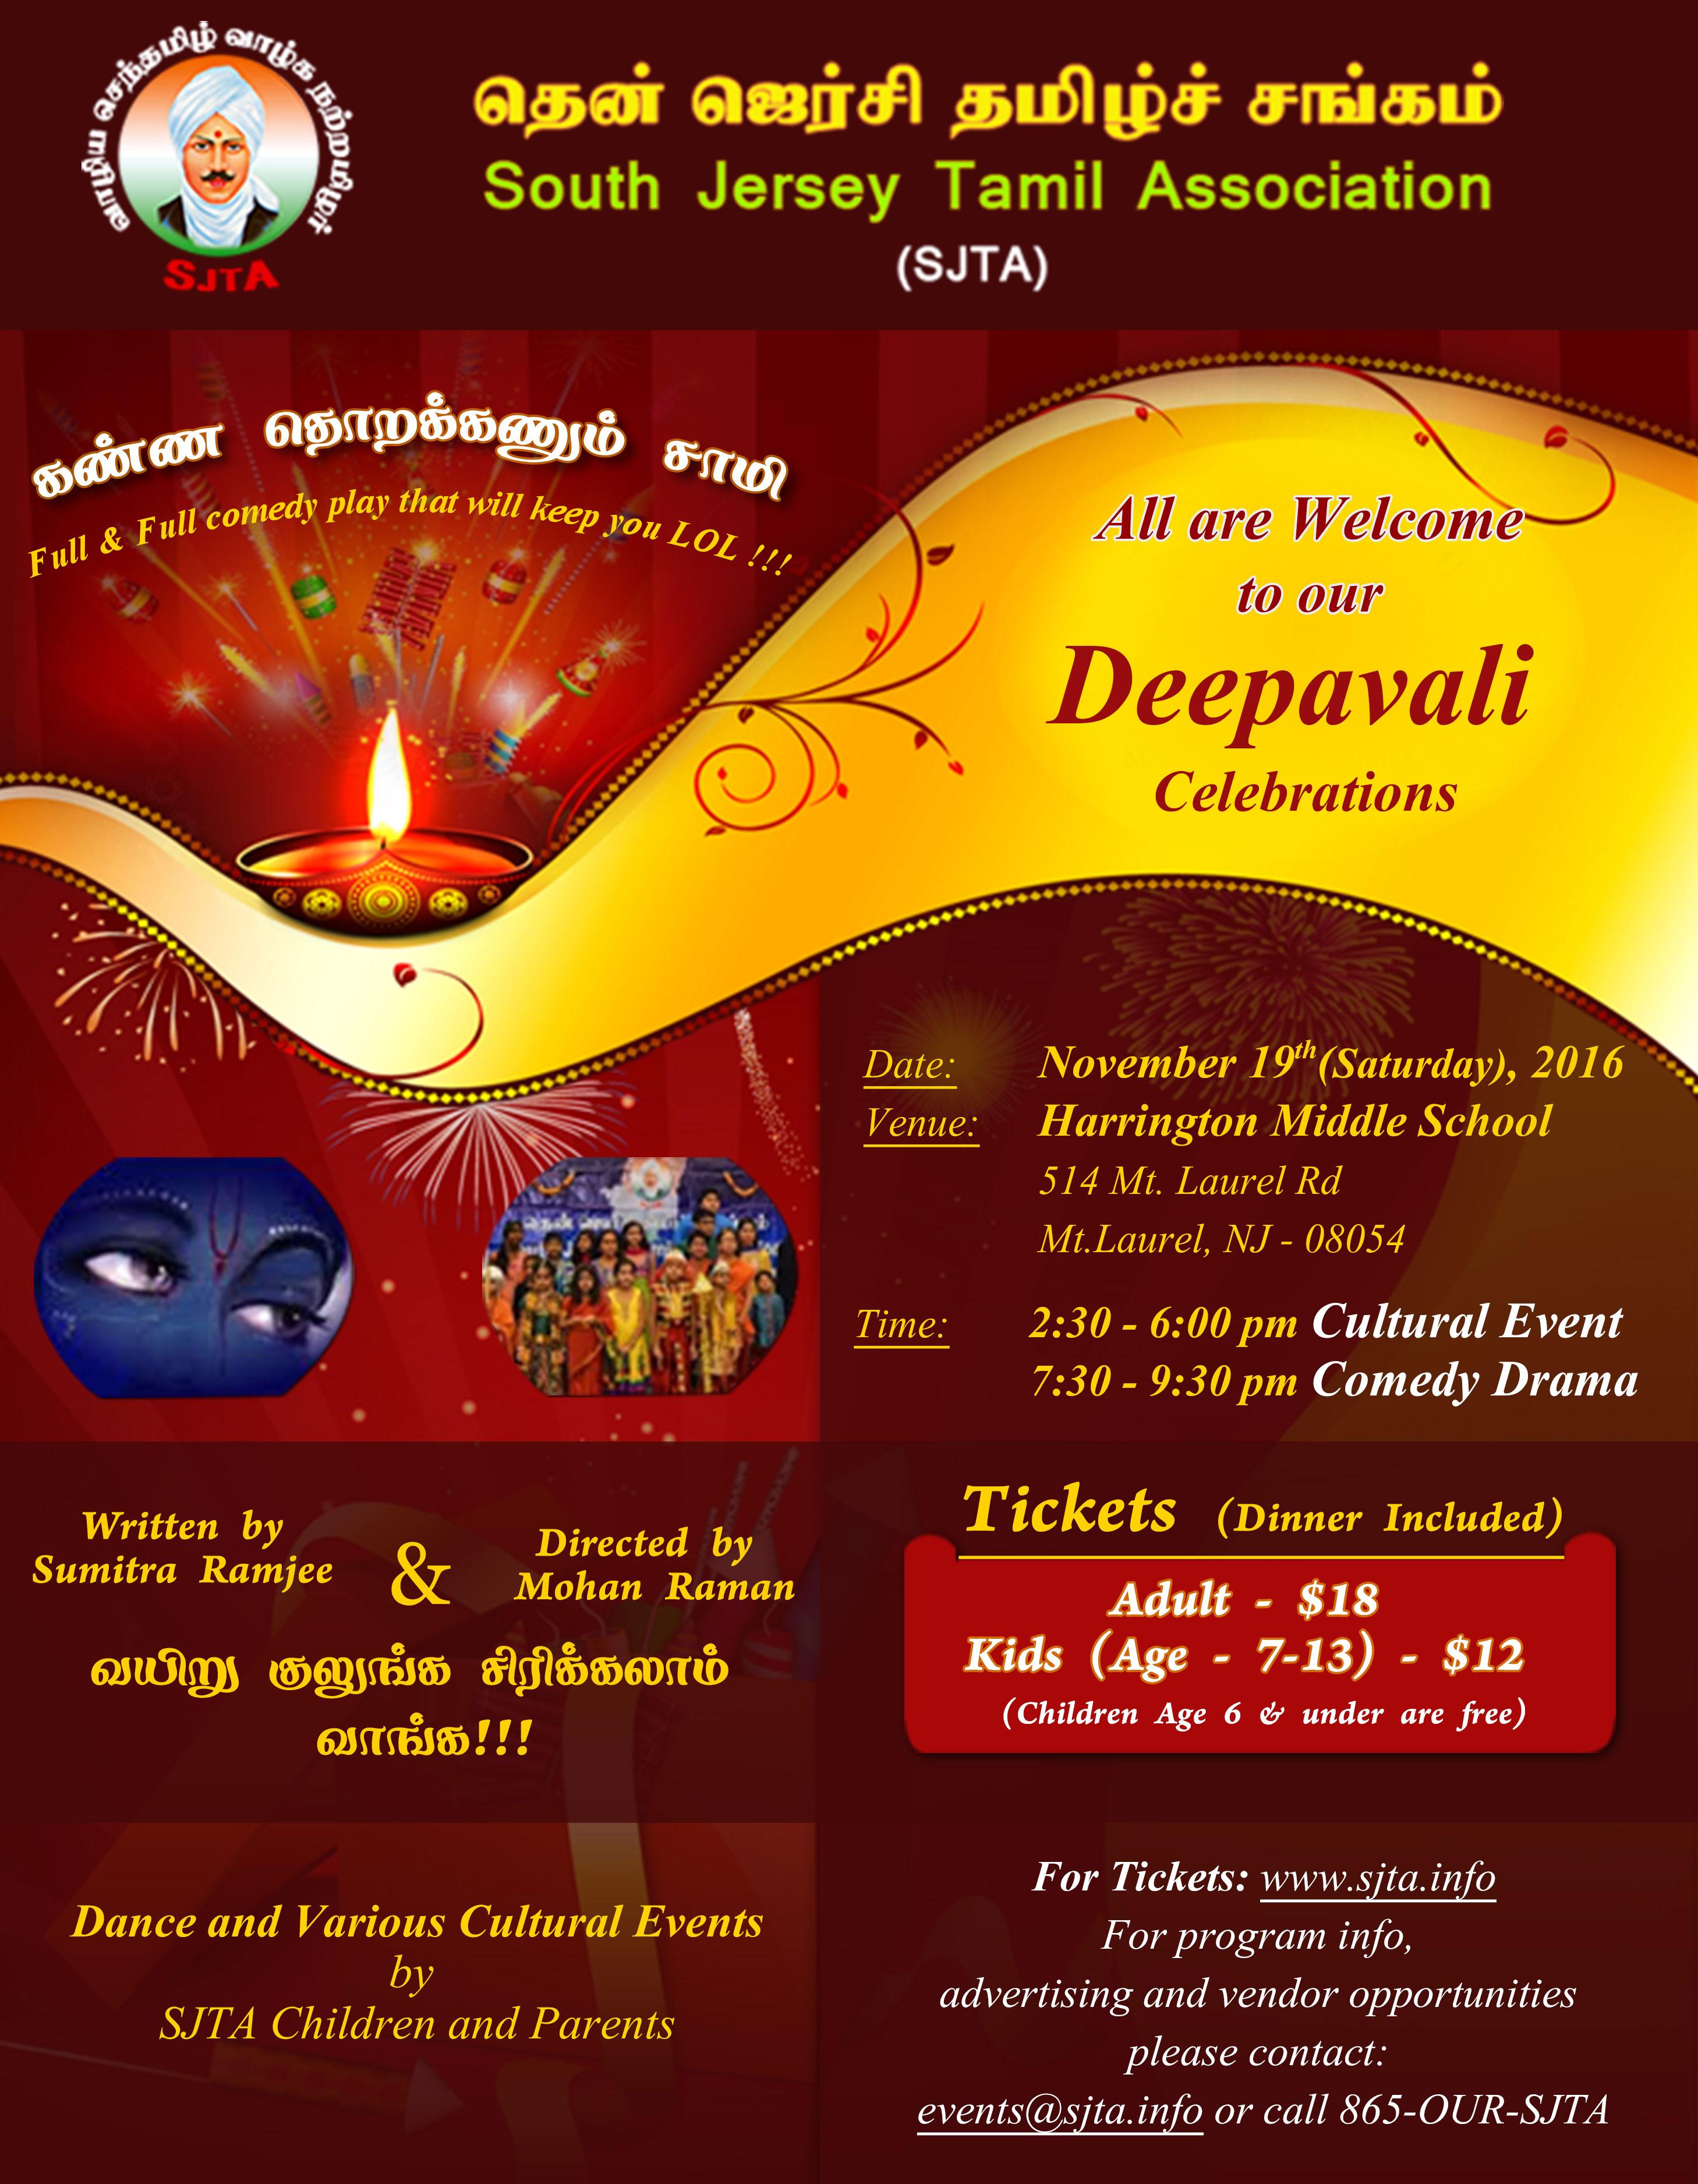 sjta-deepavali-events